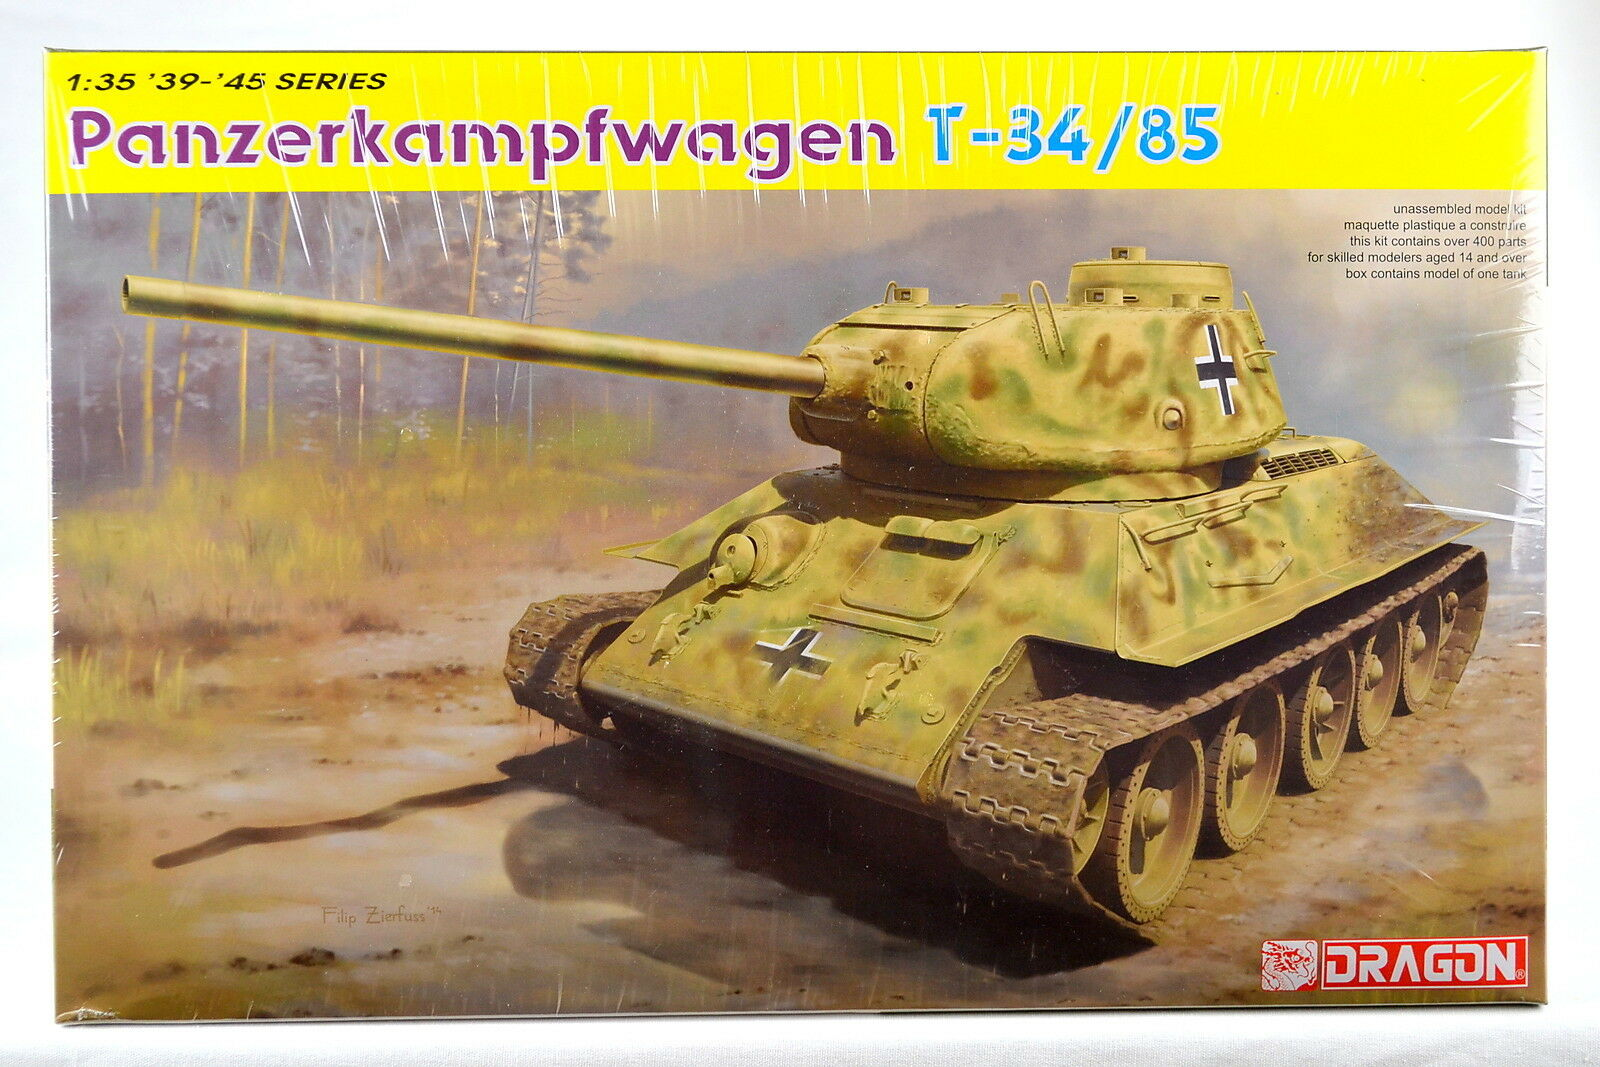 Dragon 6759 1 35 Panzerkampfwagen T-34 85 (No.112 Factory, 1944 Production)